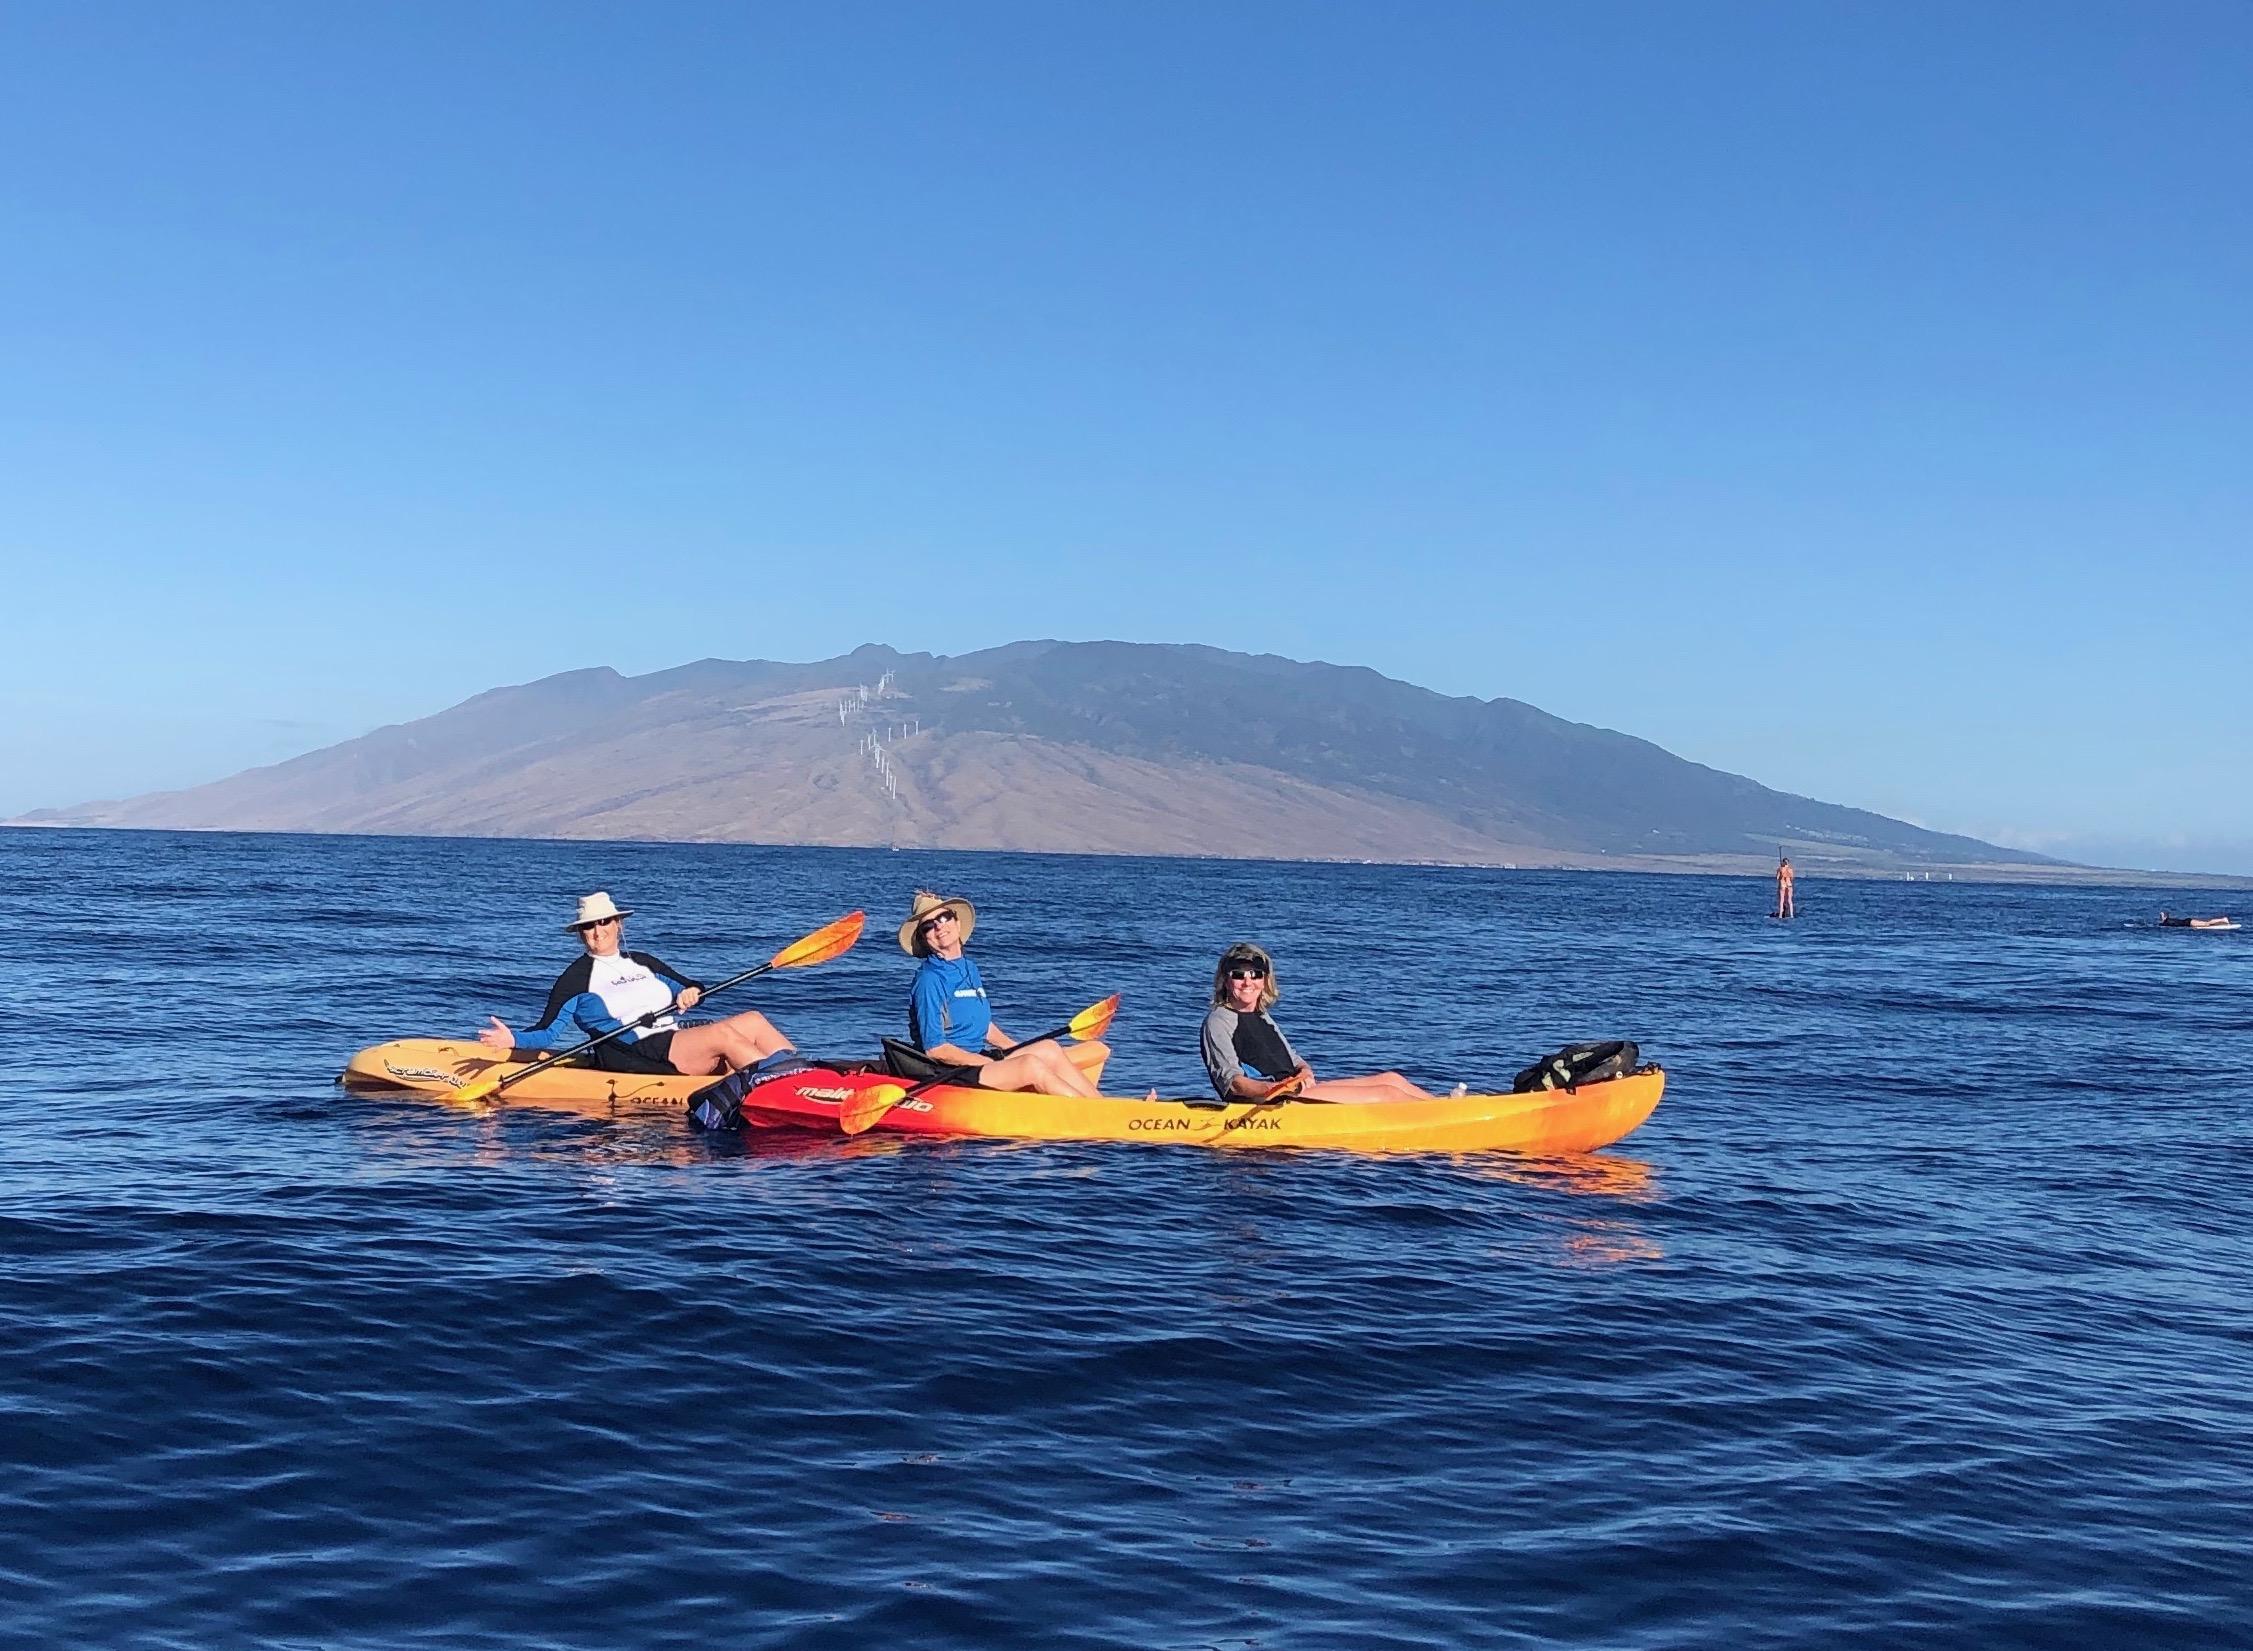 Three amigos on a dawn kayaking trip